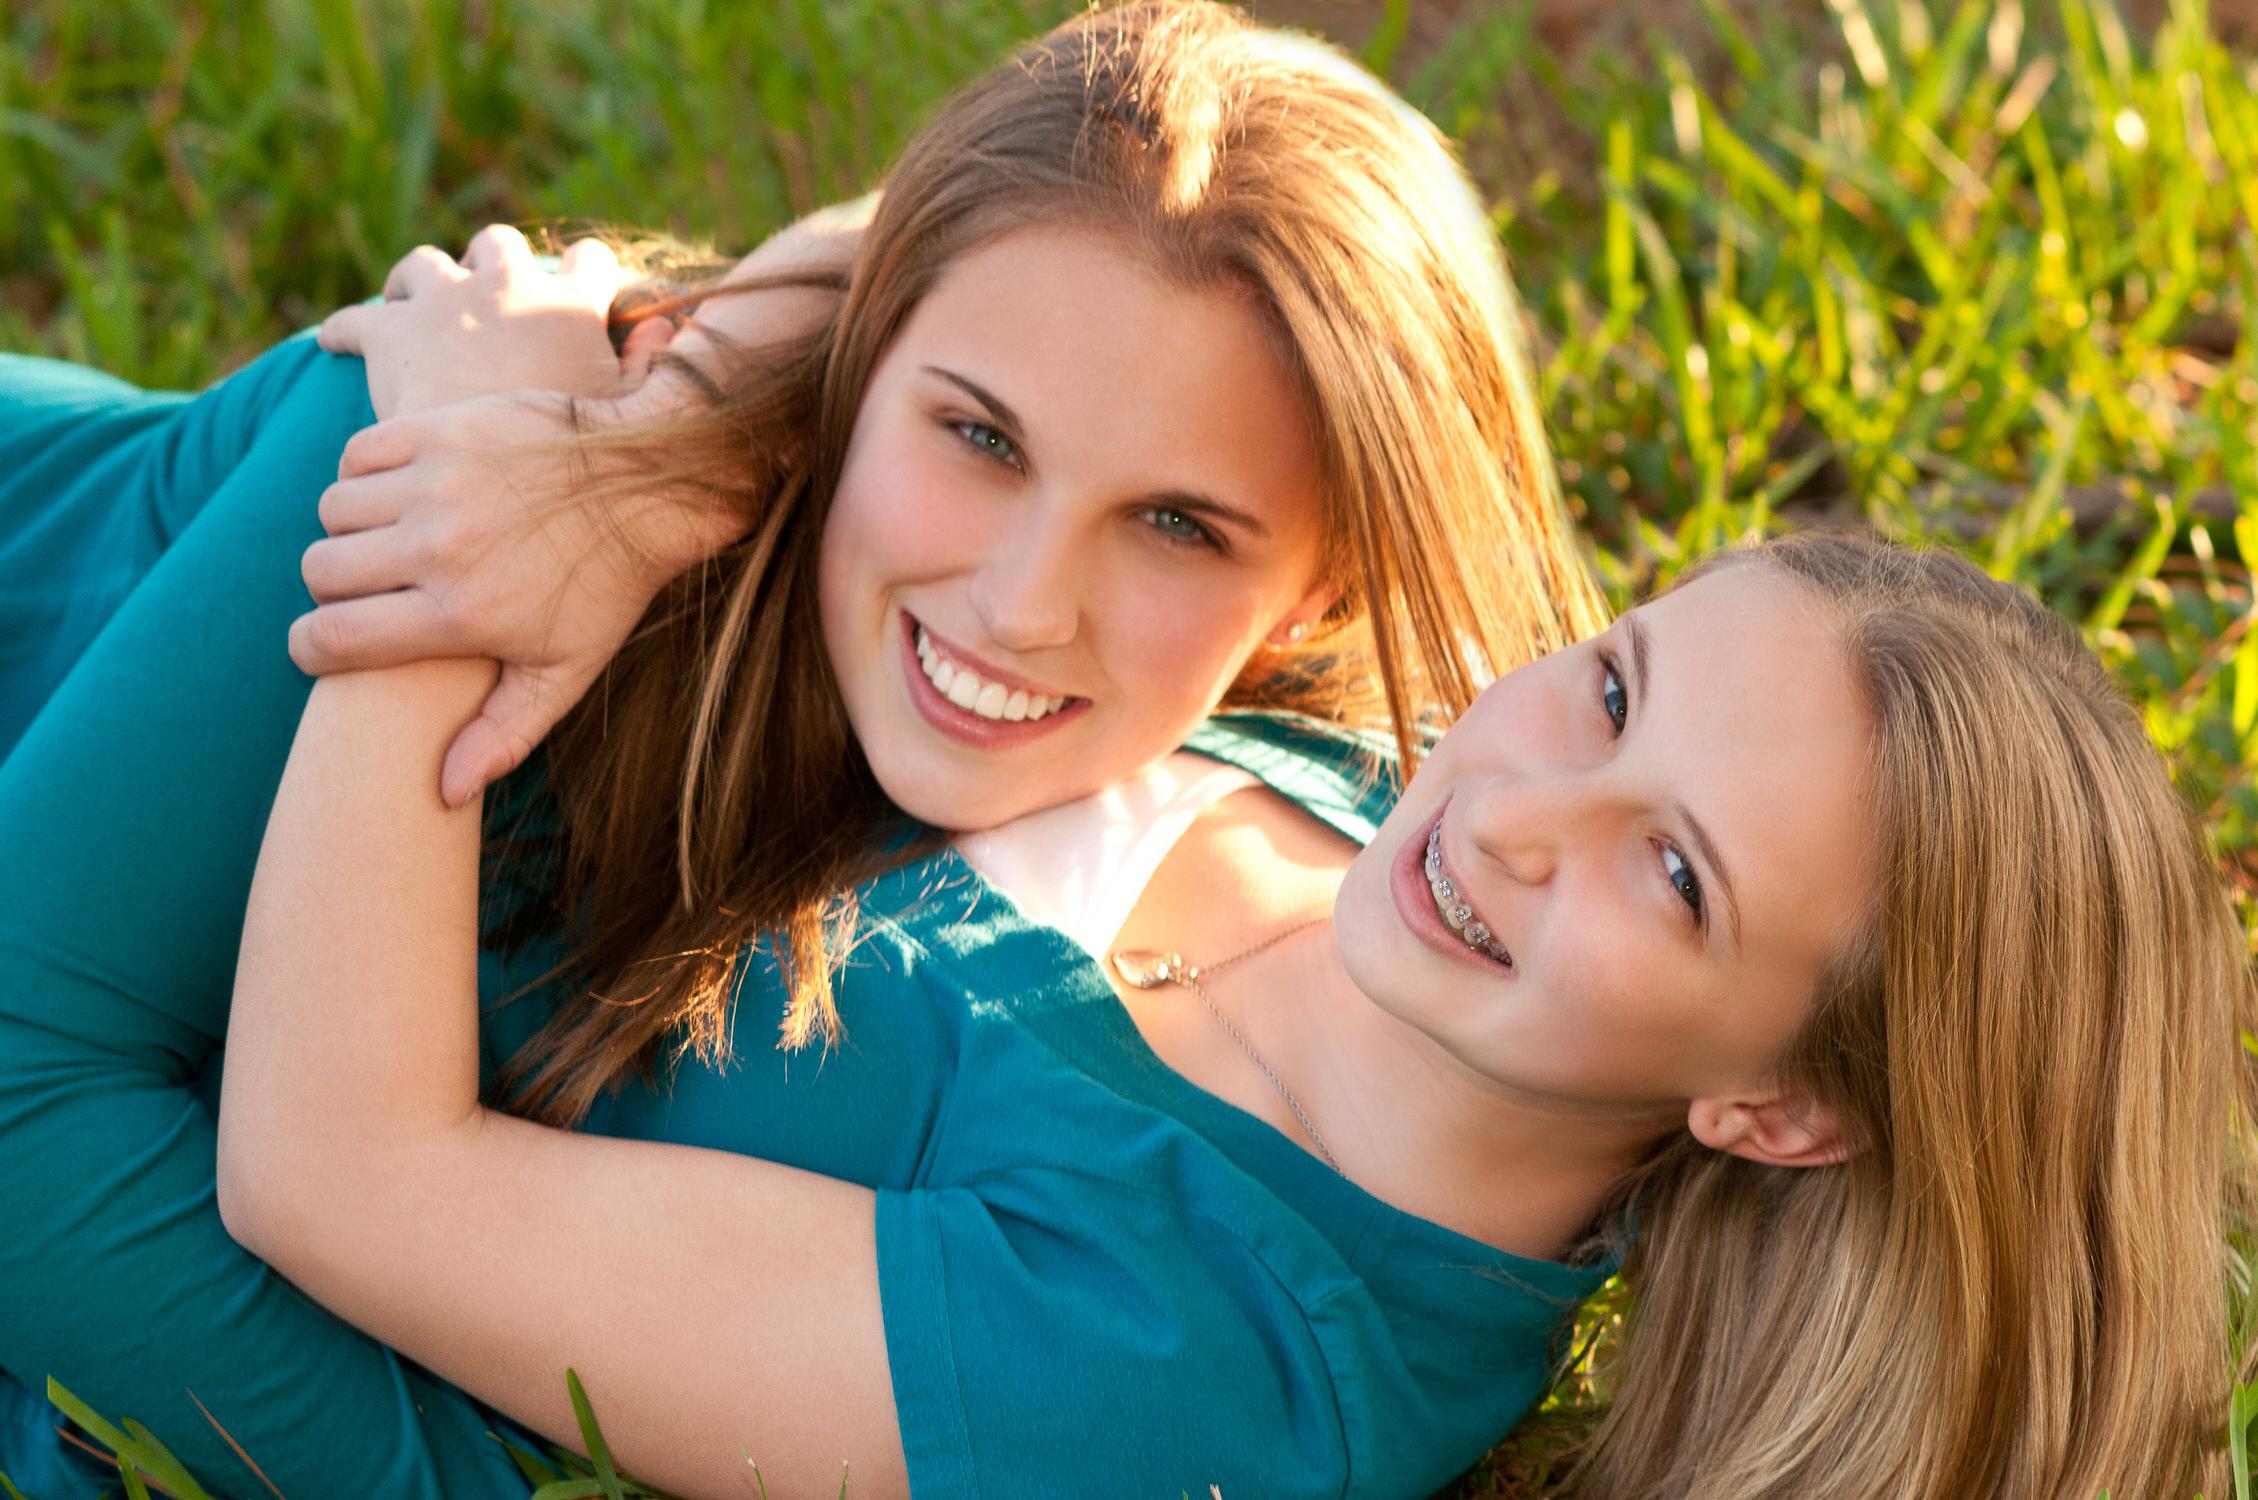 Kim-Riley-Portraitr-Editorial-Advertising-Best-Top-teens-Photography-school-lifestyle-Photographer-Houston-Texas-Kingwood-Catherine-McKillop-14.jpg